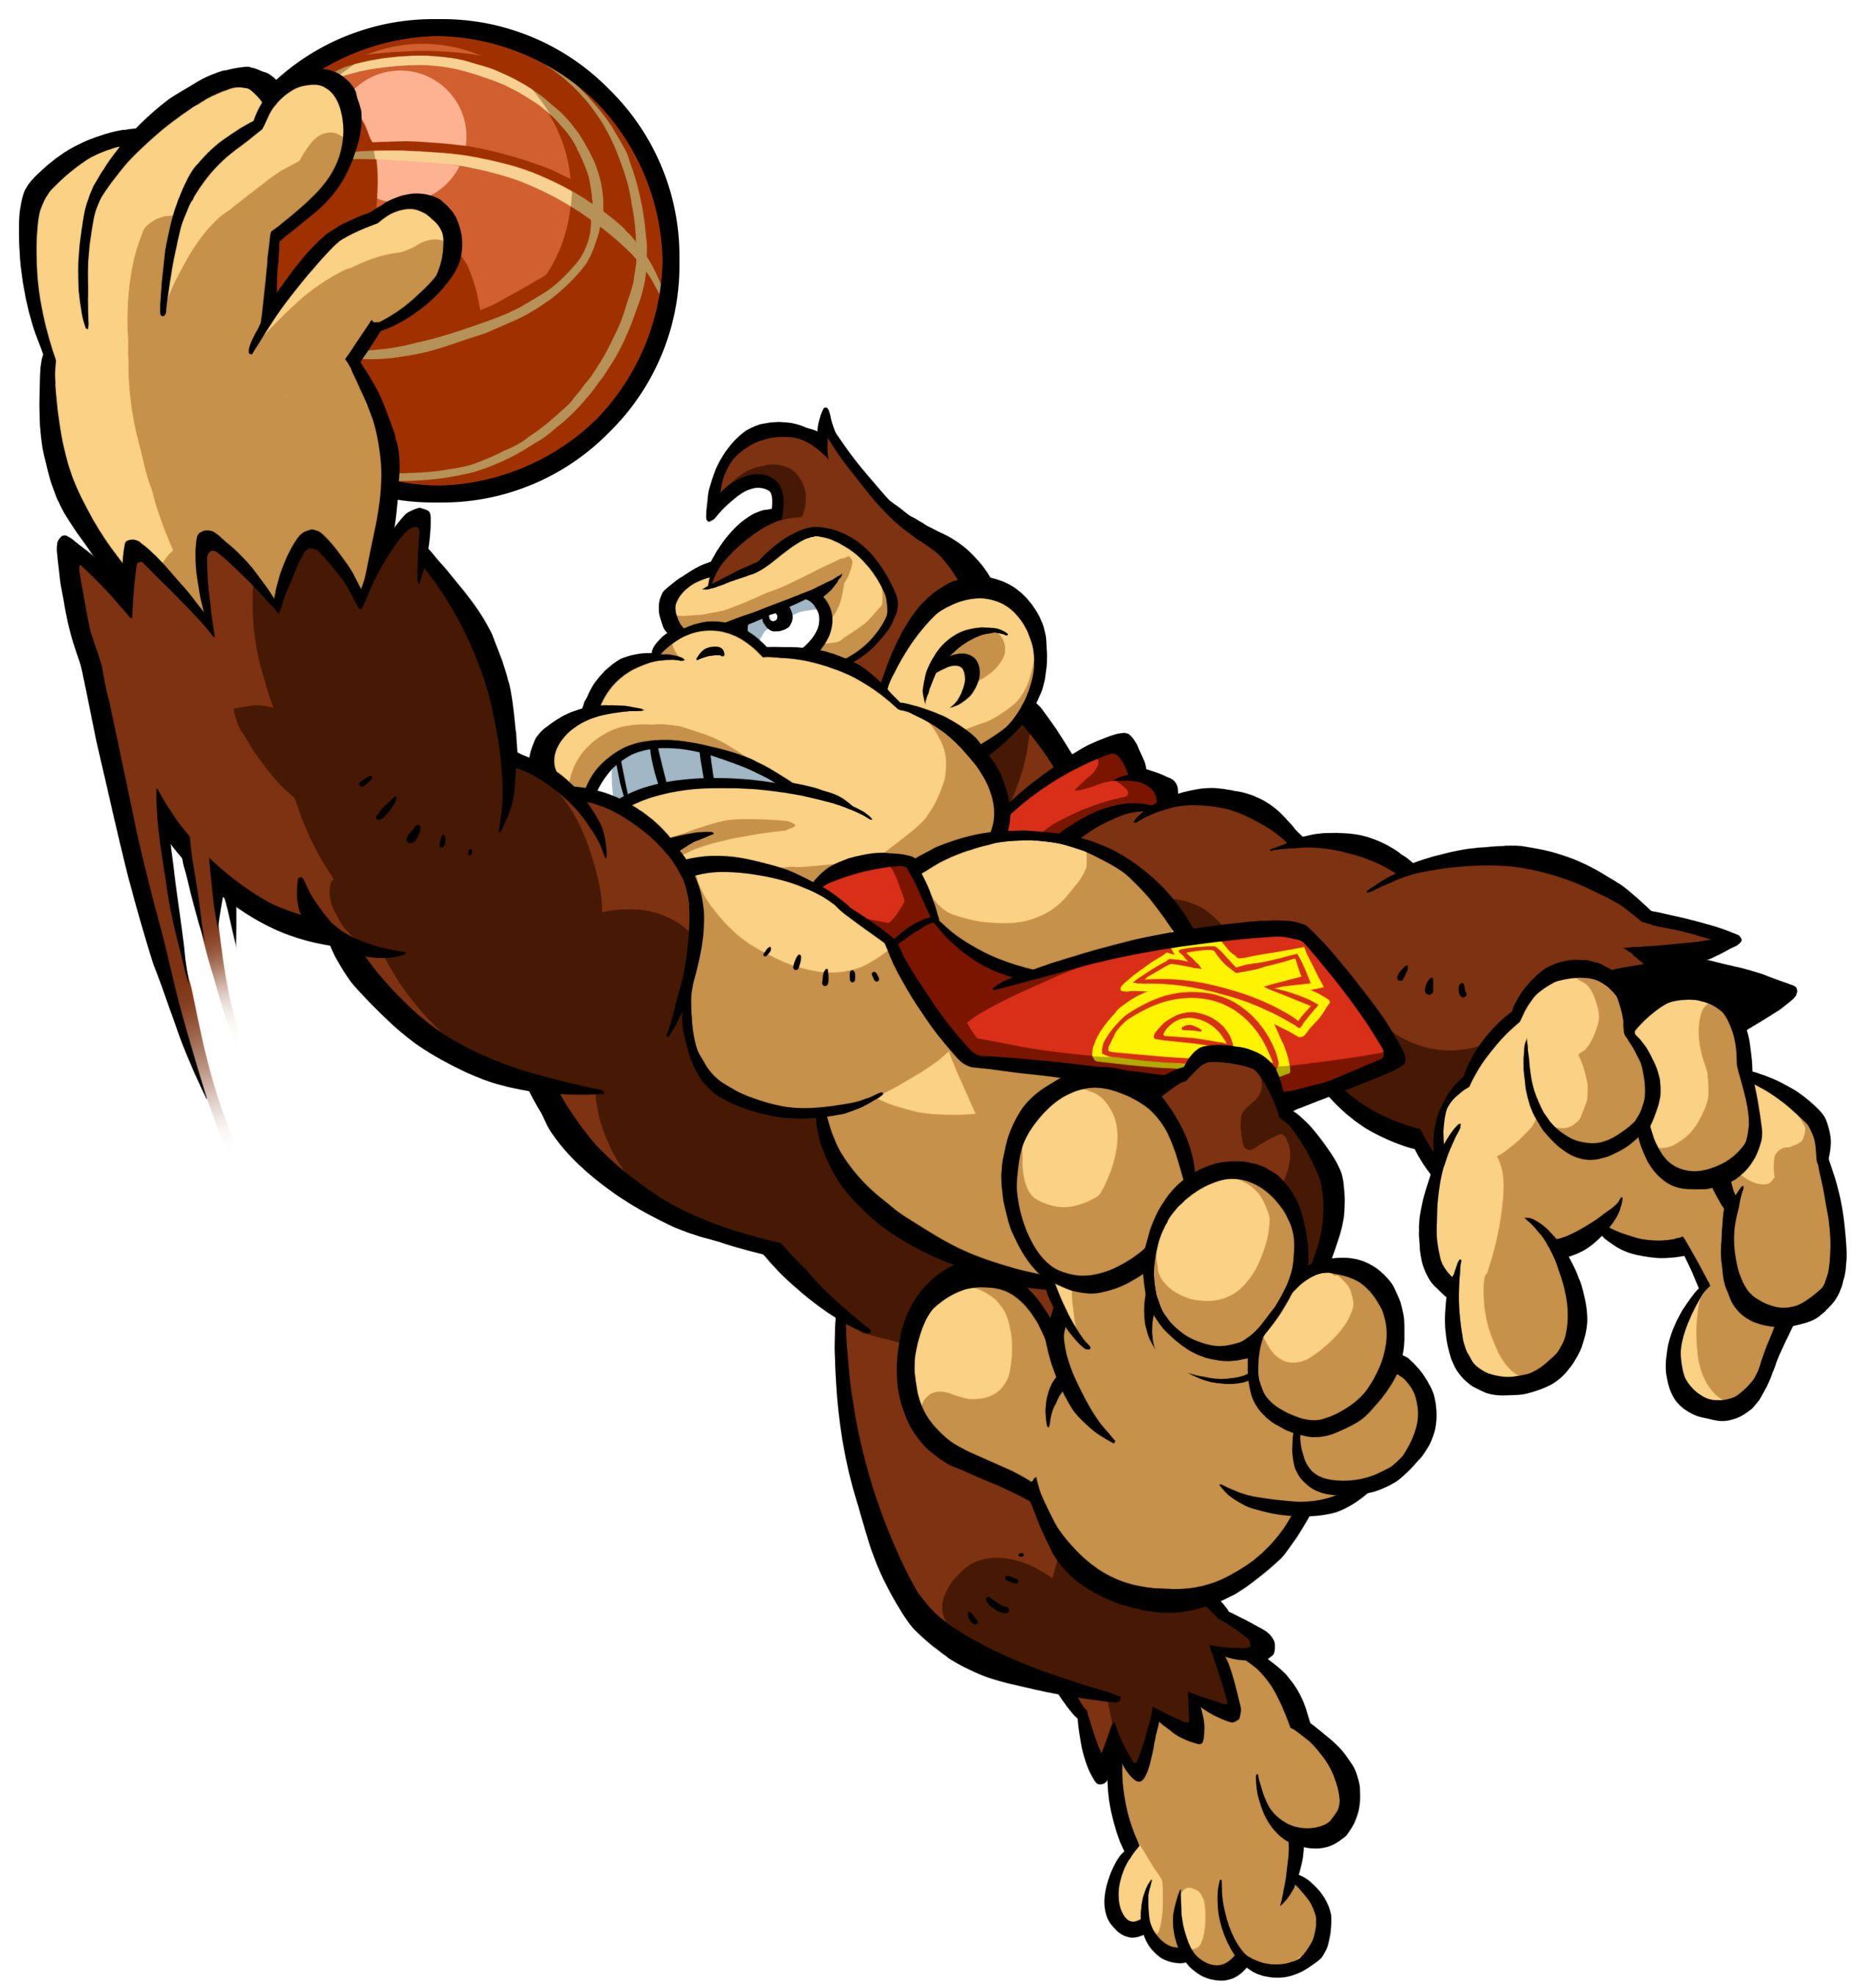 Kleurplaten Mario Vs Donkey Kong.Uniek Kleurplaten Mario Vs Donkey Kong Klupaats Website